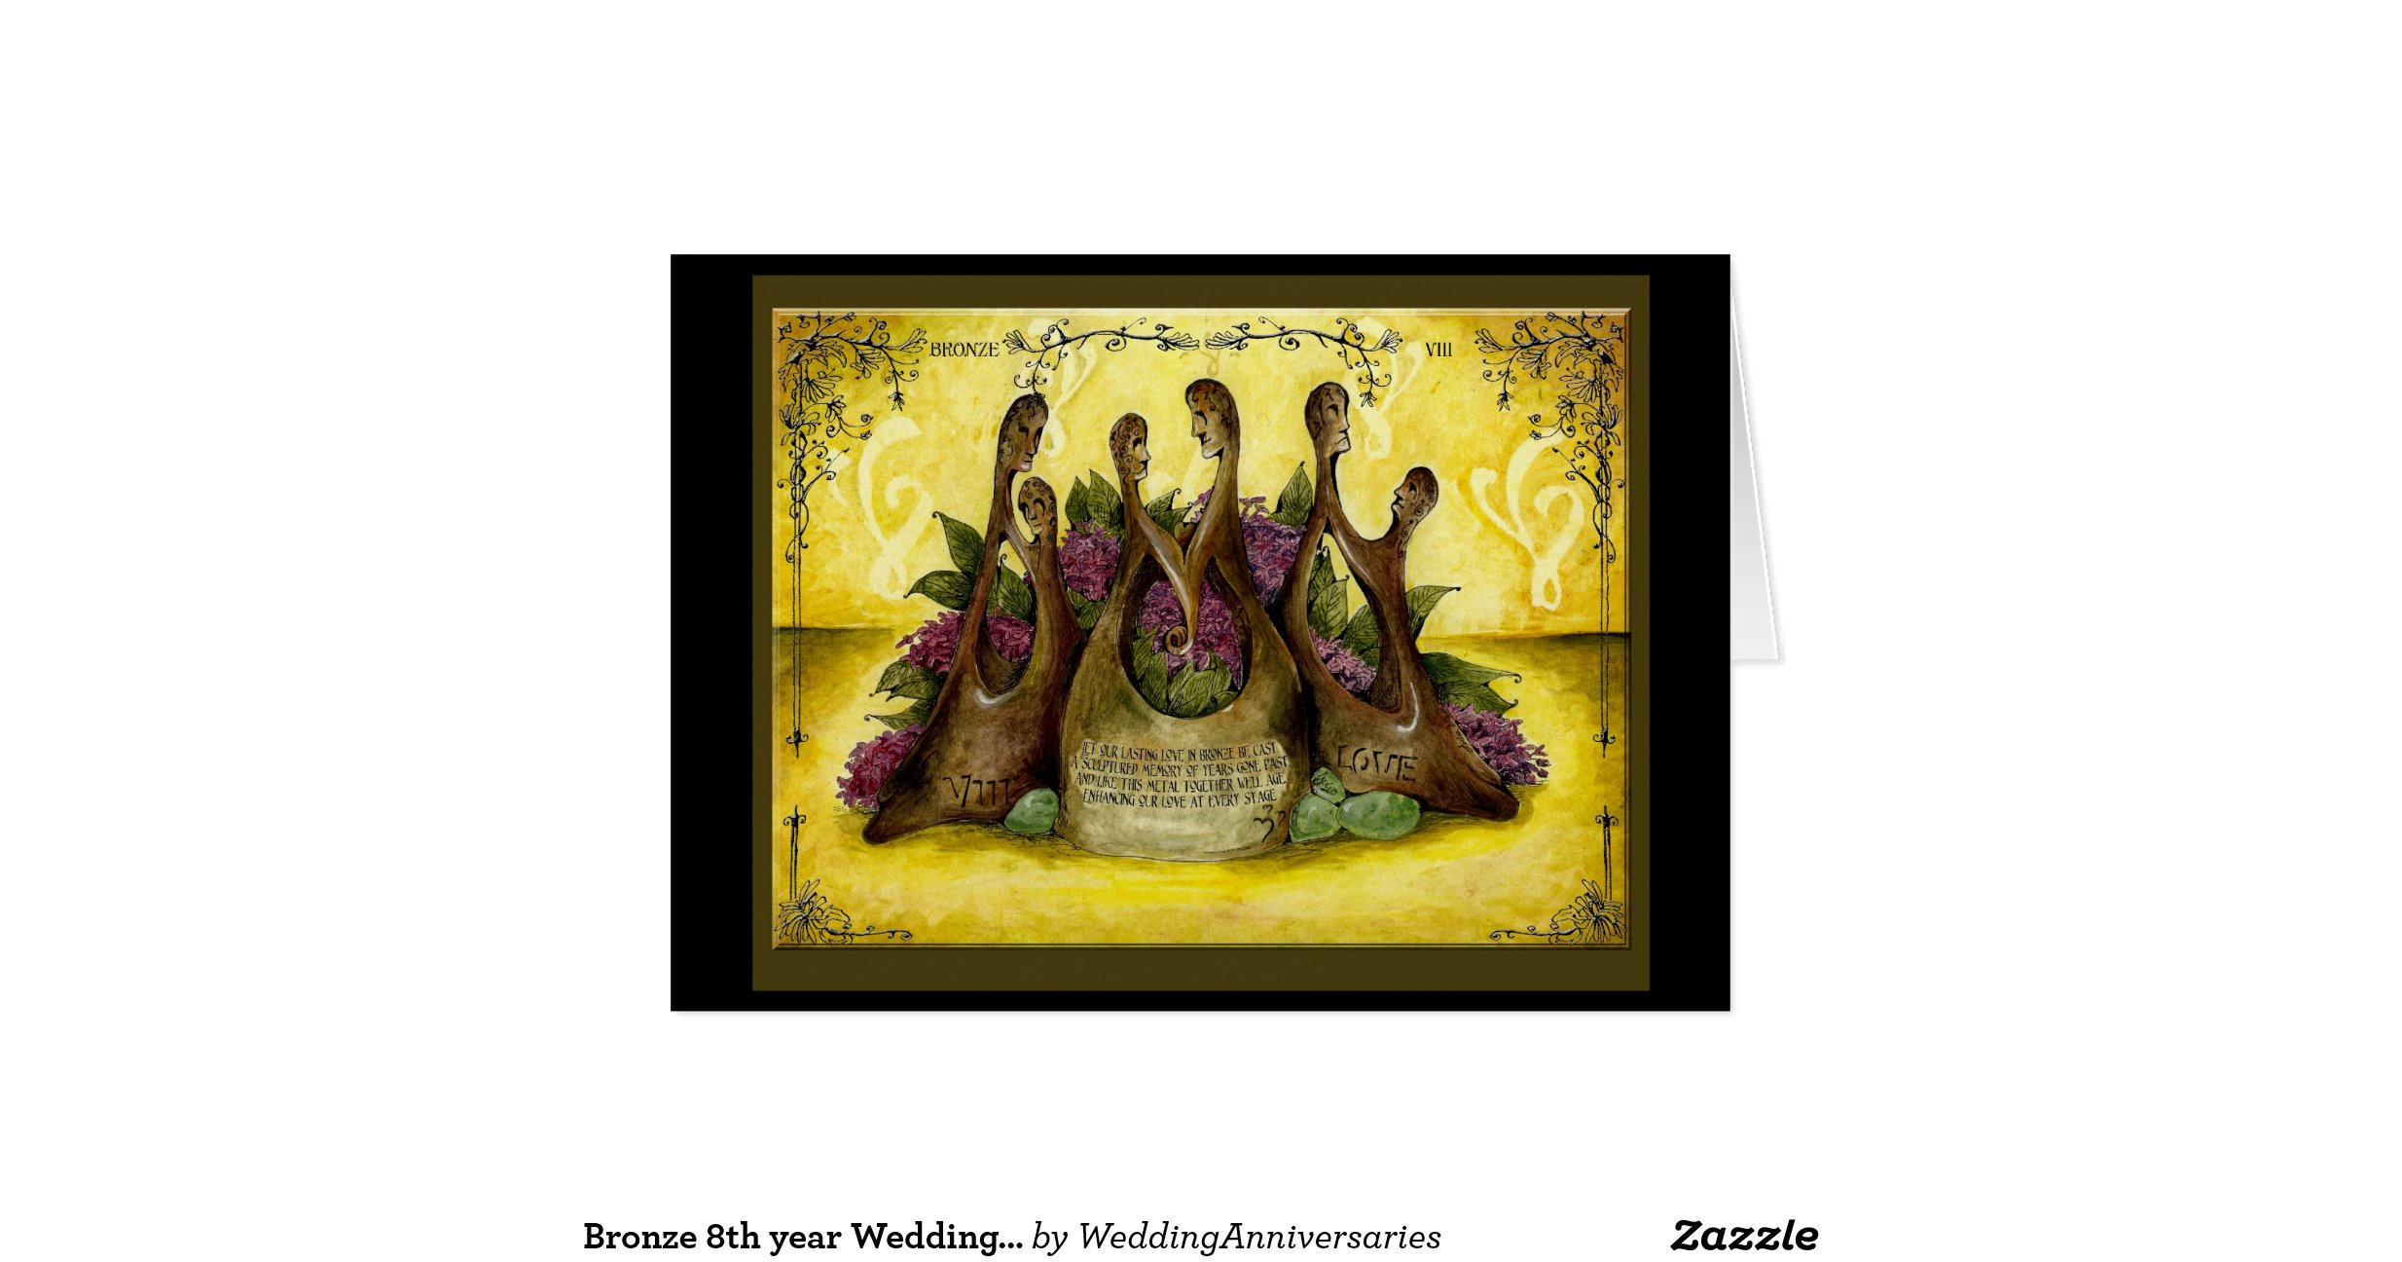 8 Year Wedding Anniversary Traditional Gift: Bronze_8th_year_wedding_anniversary_gift_card